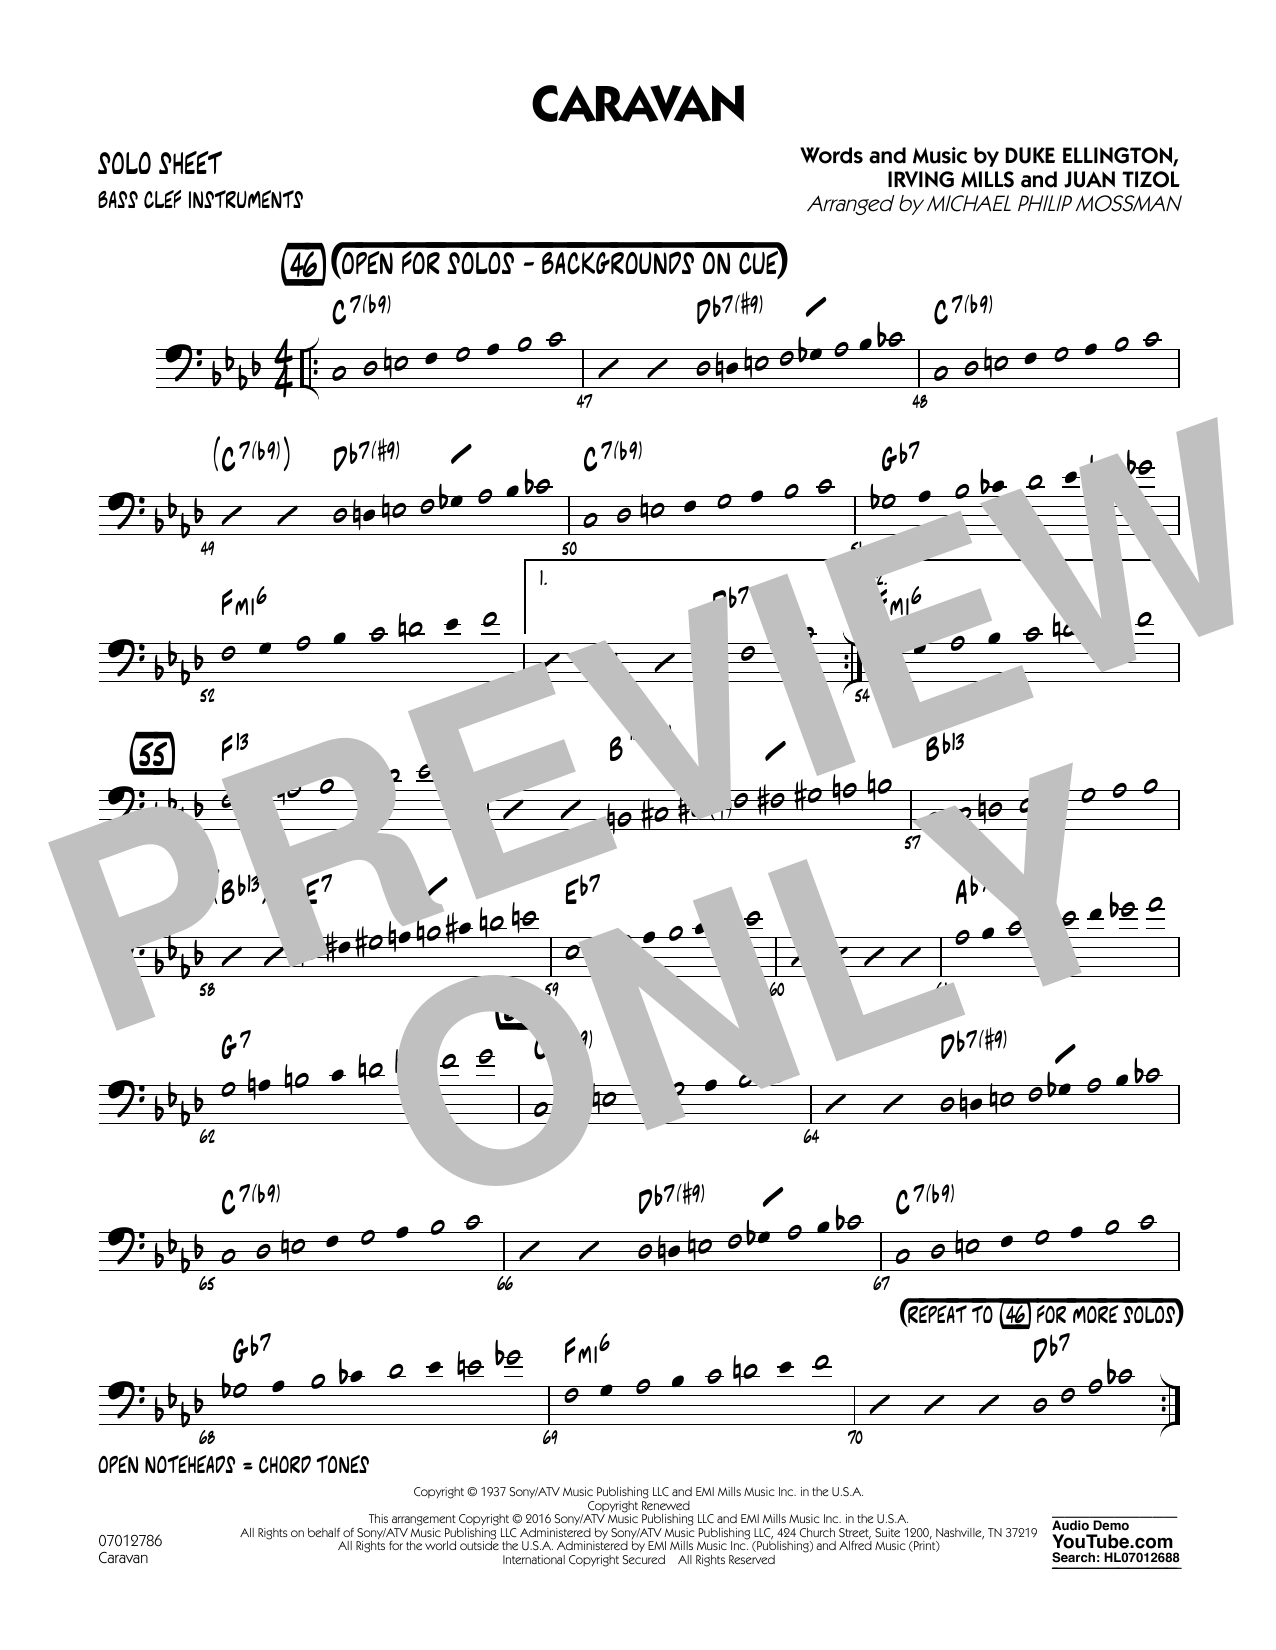 Caravan Bass Clef Solo Sheet Sheet Music To Download